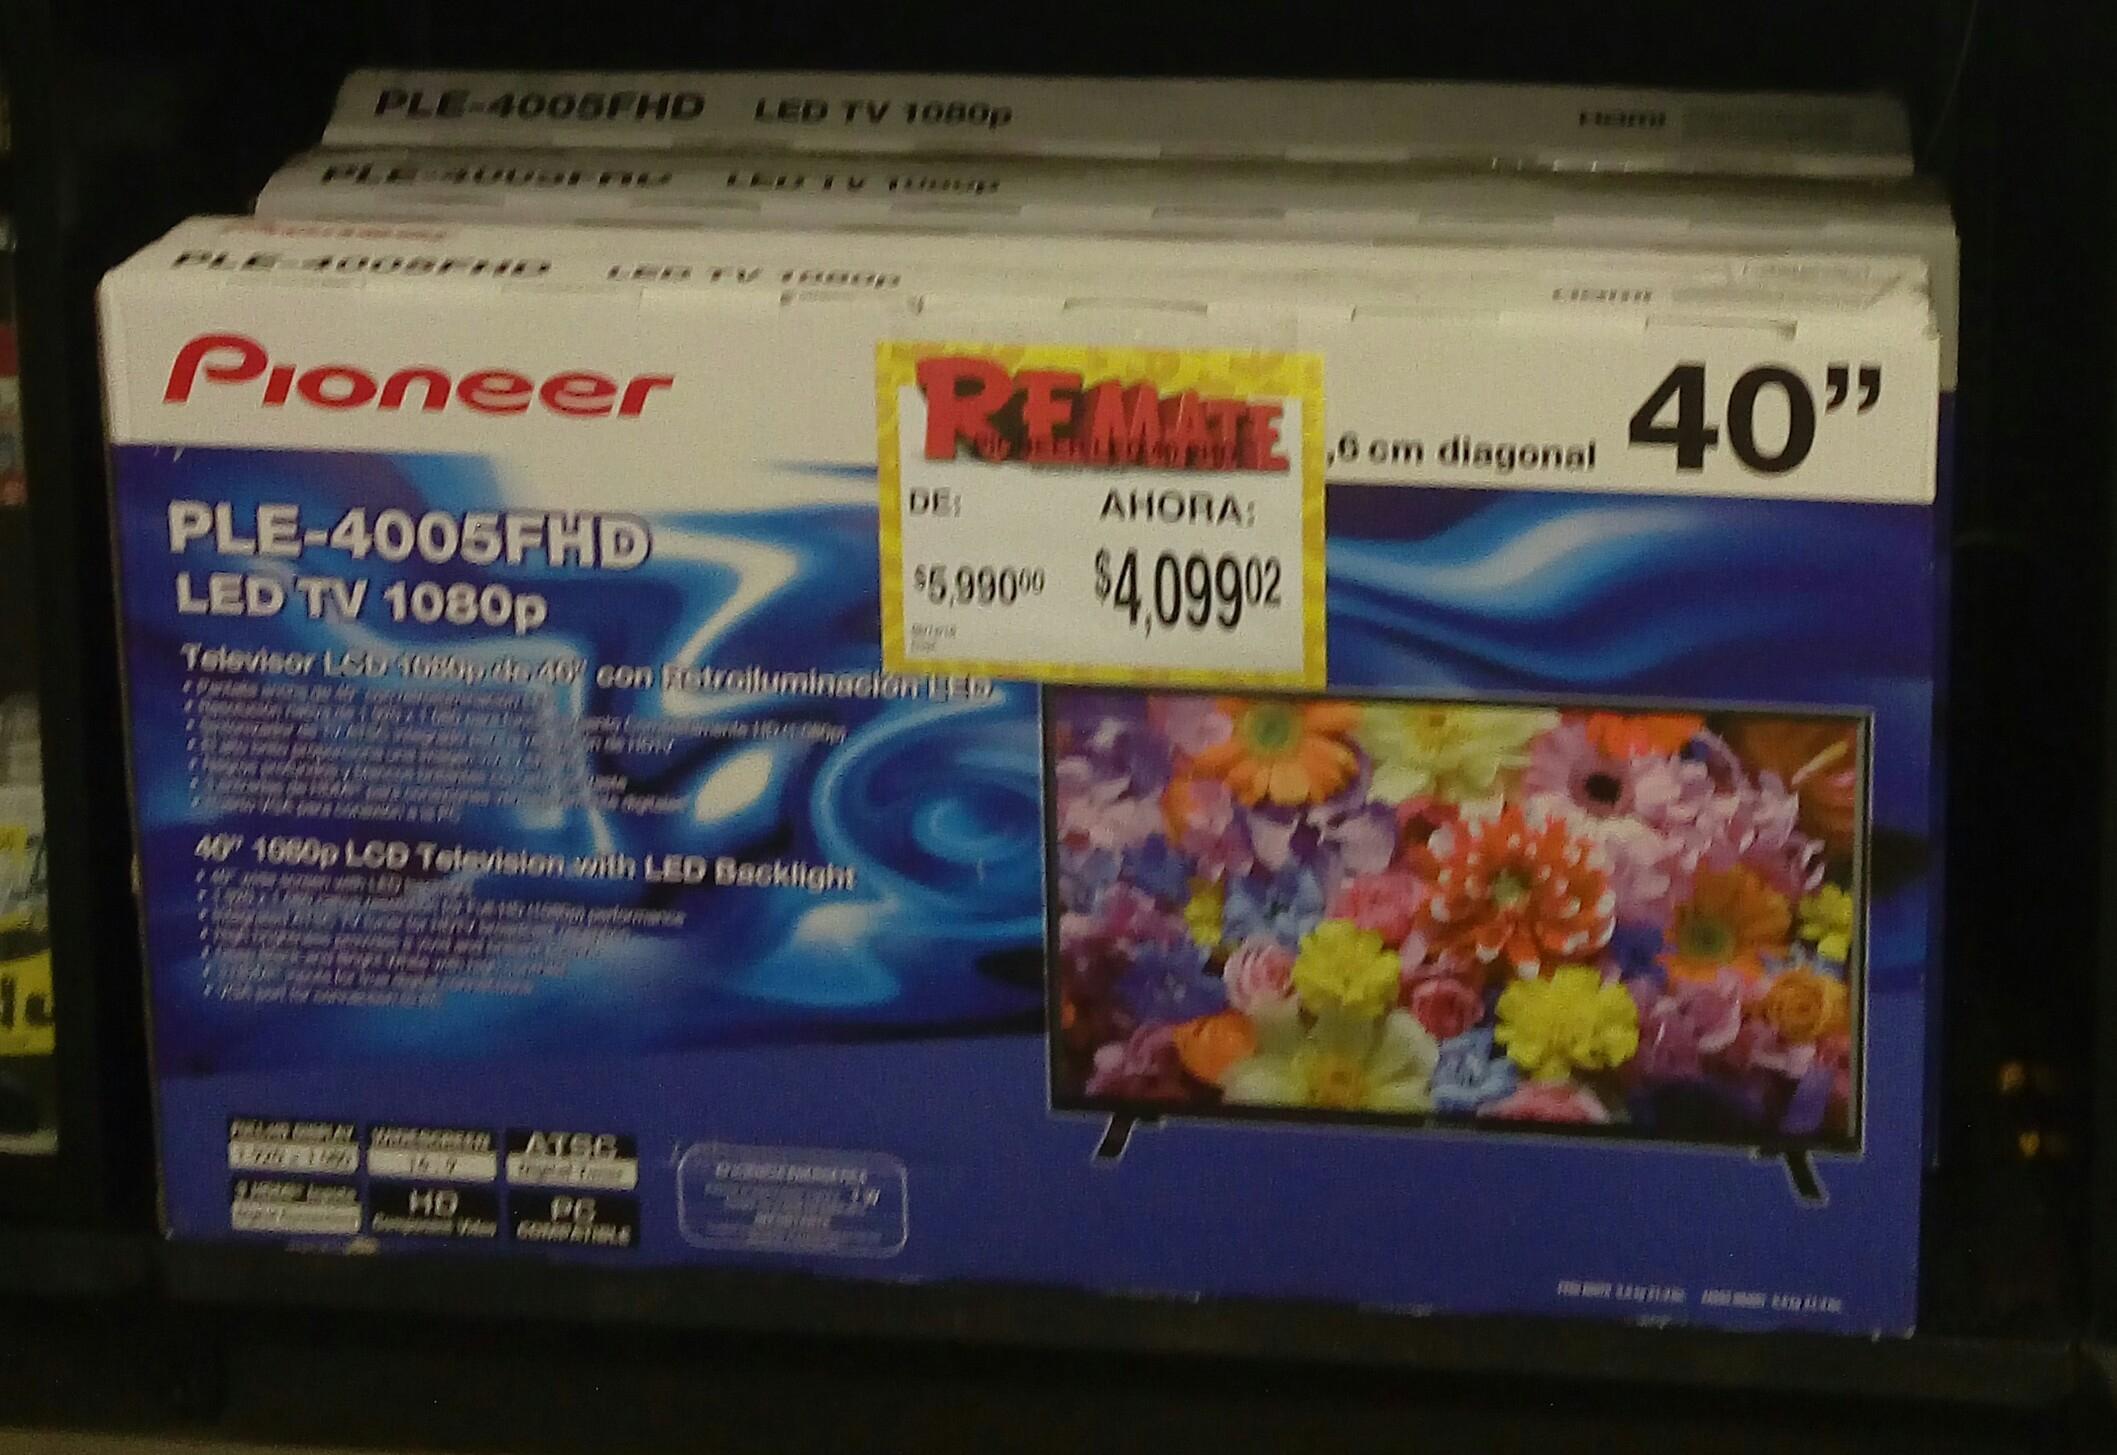 "Bodega Aurrerá Coyol Veracruz: TV LED Pioneer 40"" a $4,099.02"